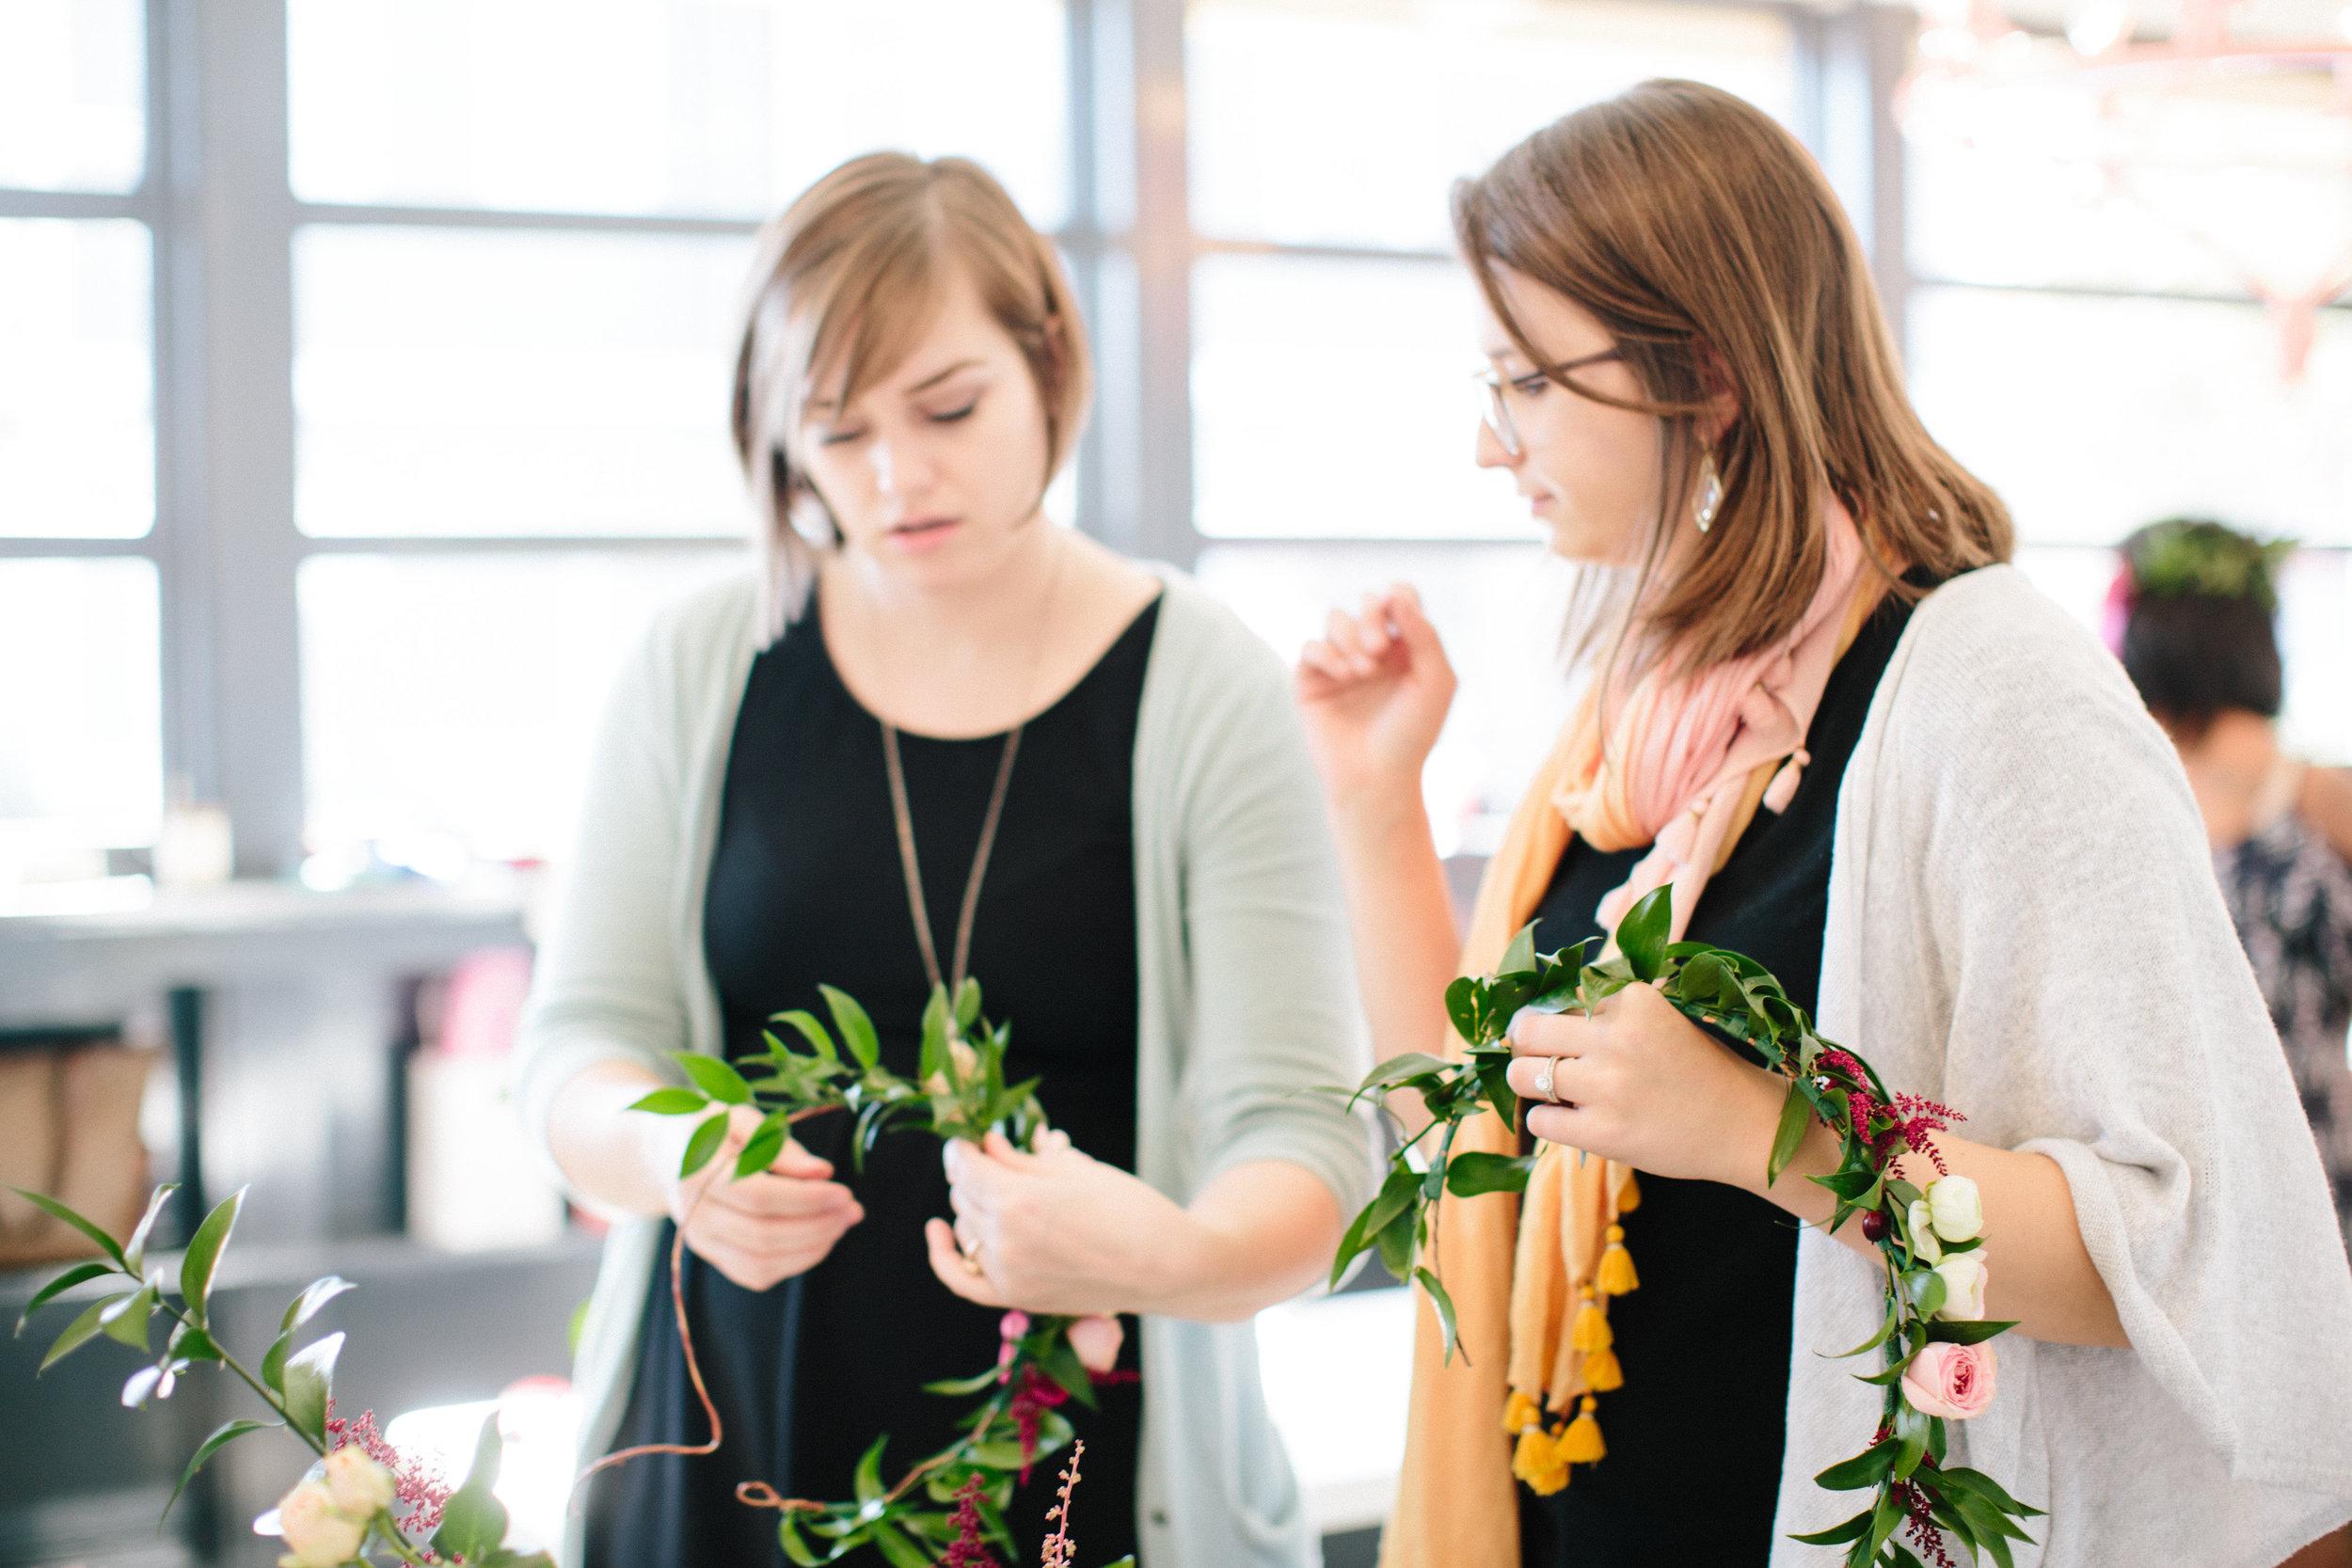 CIE Blooms and Brunch Workshop in Norfolk Virginia with Courtney Inghram Events